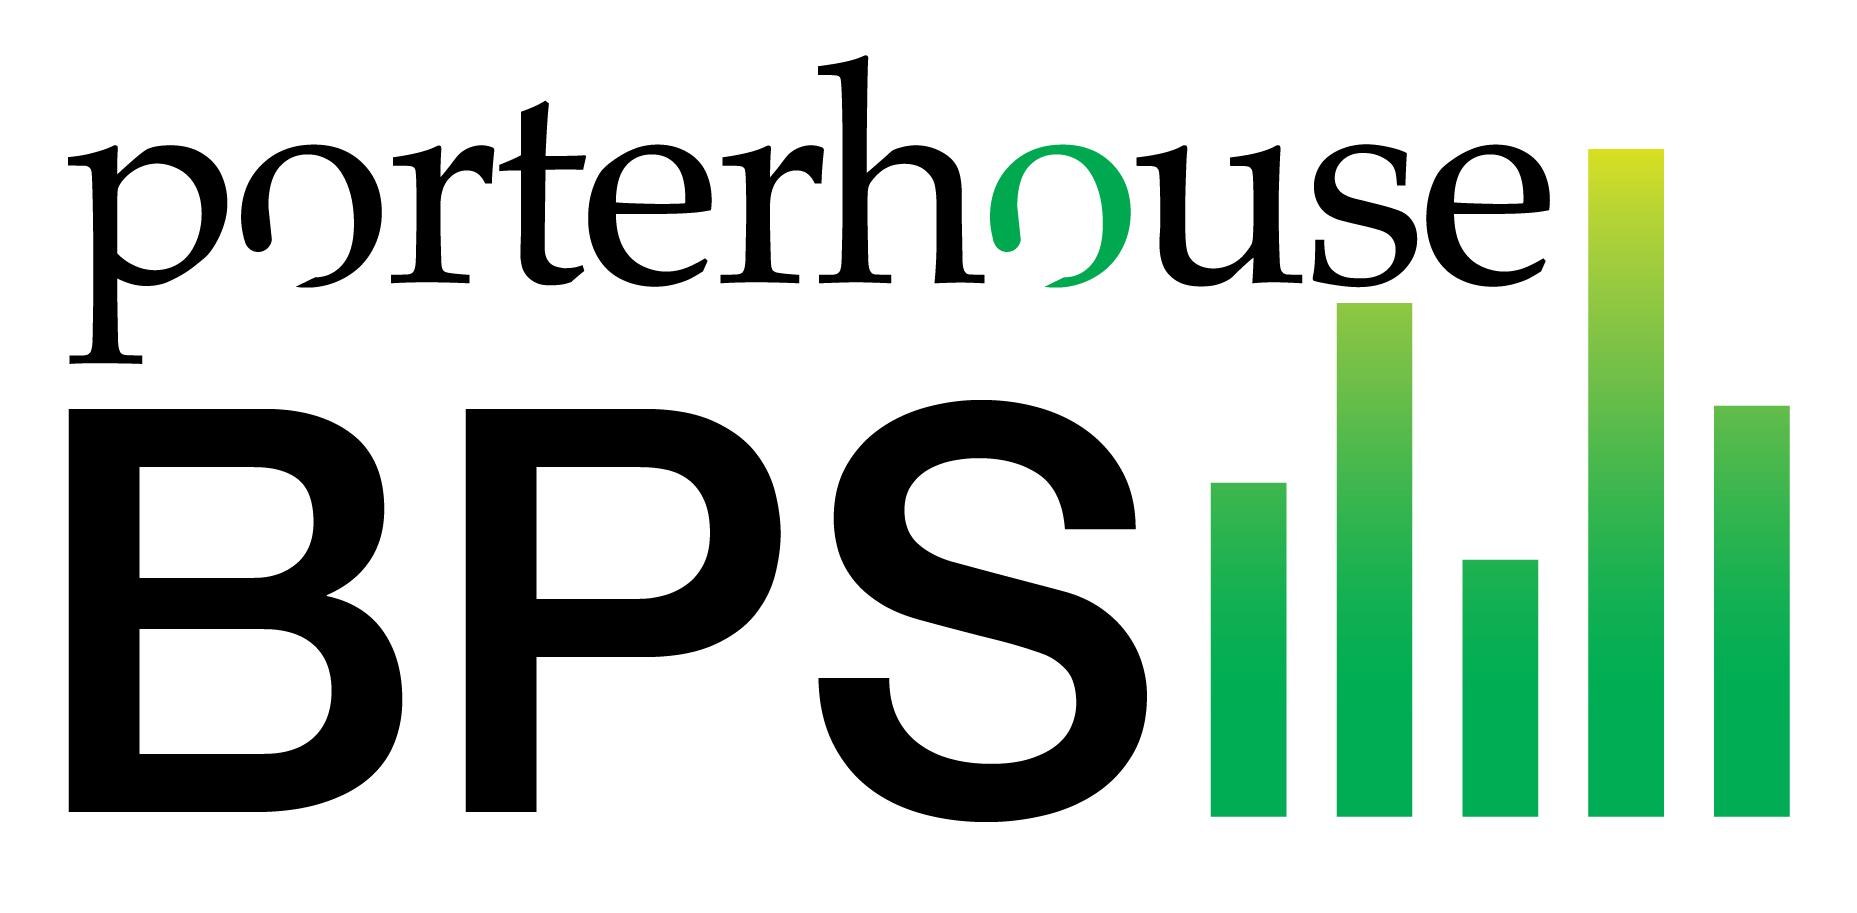 Porterhouse BPS logo